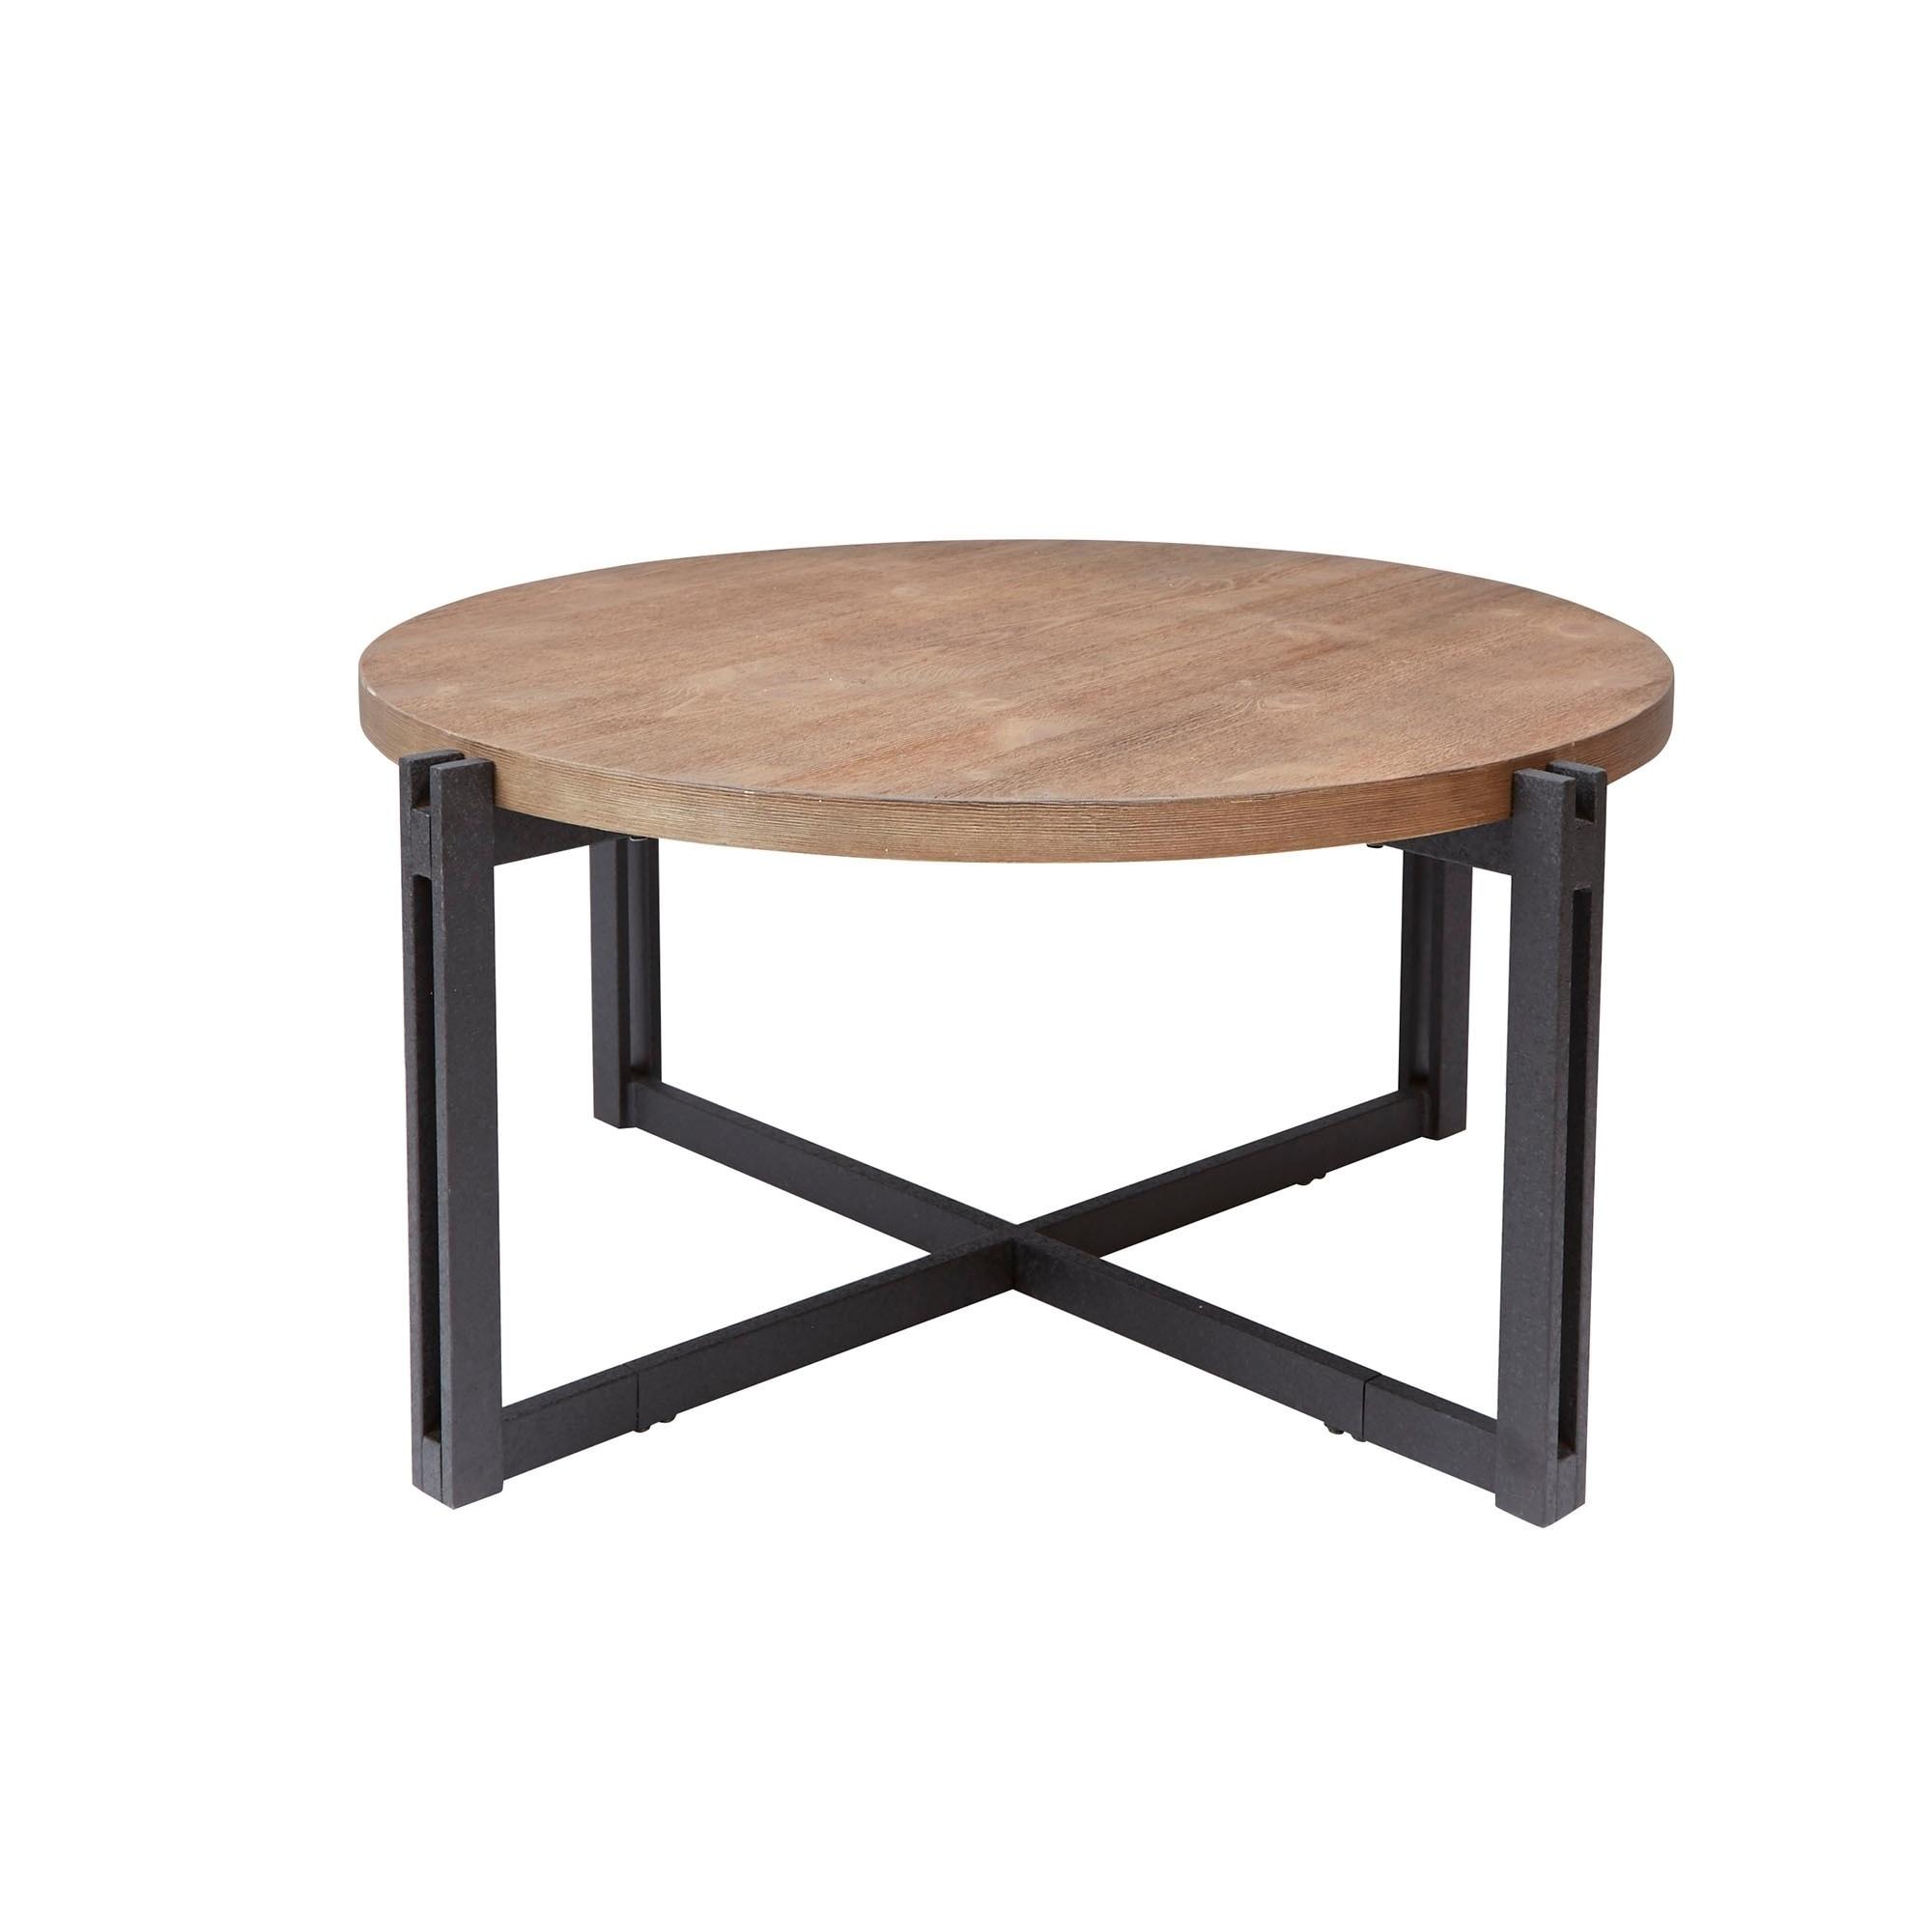 Dakota Iron Sled Base Cross-frame Coffee Table with Round...